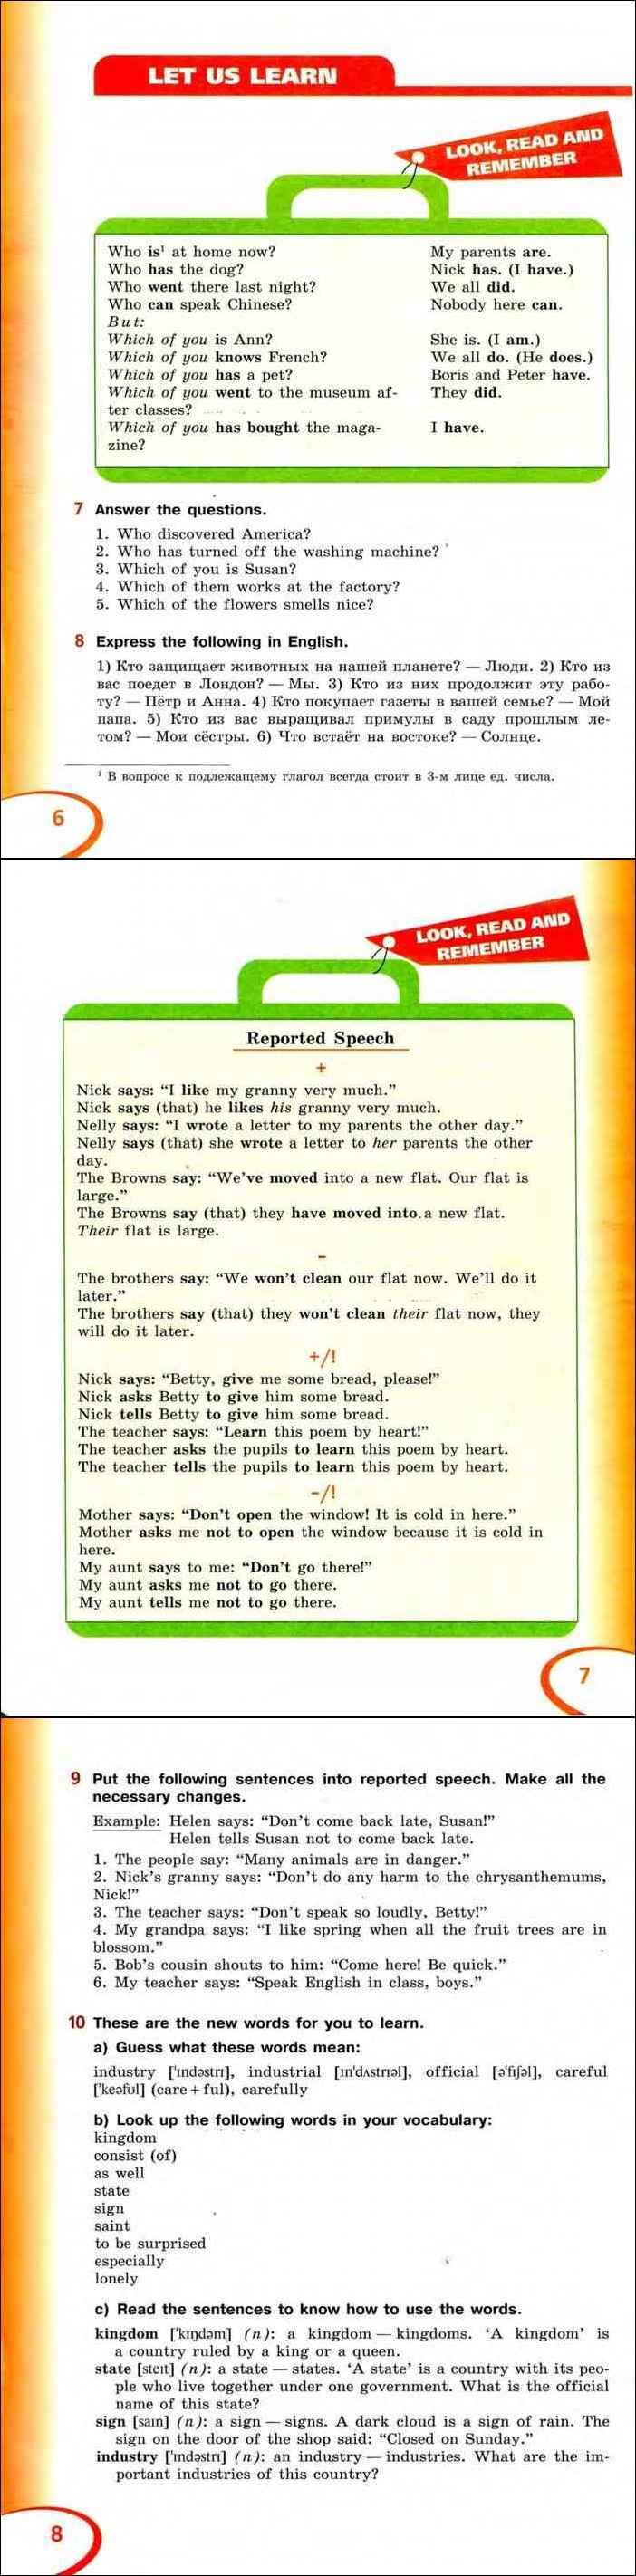 royal london текст из учебника 6 класс афанасьева